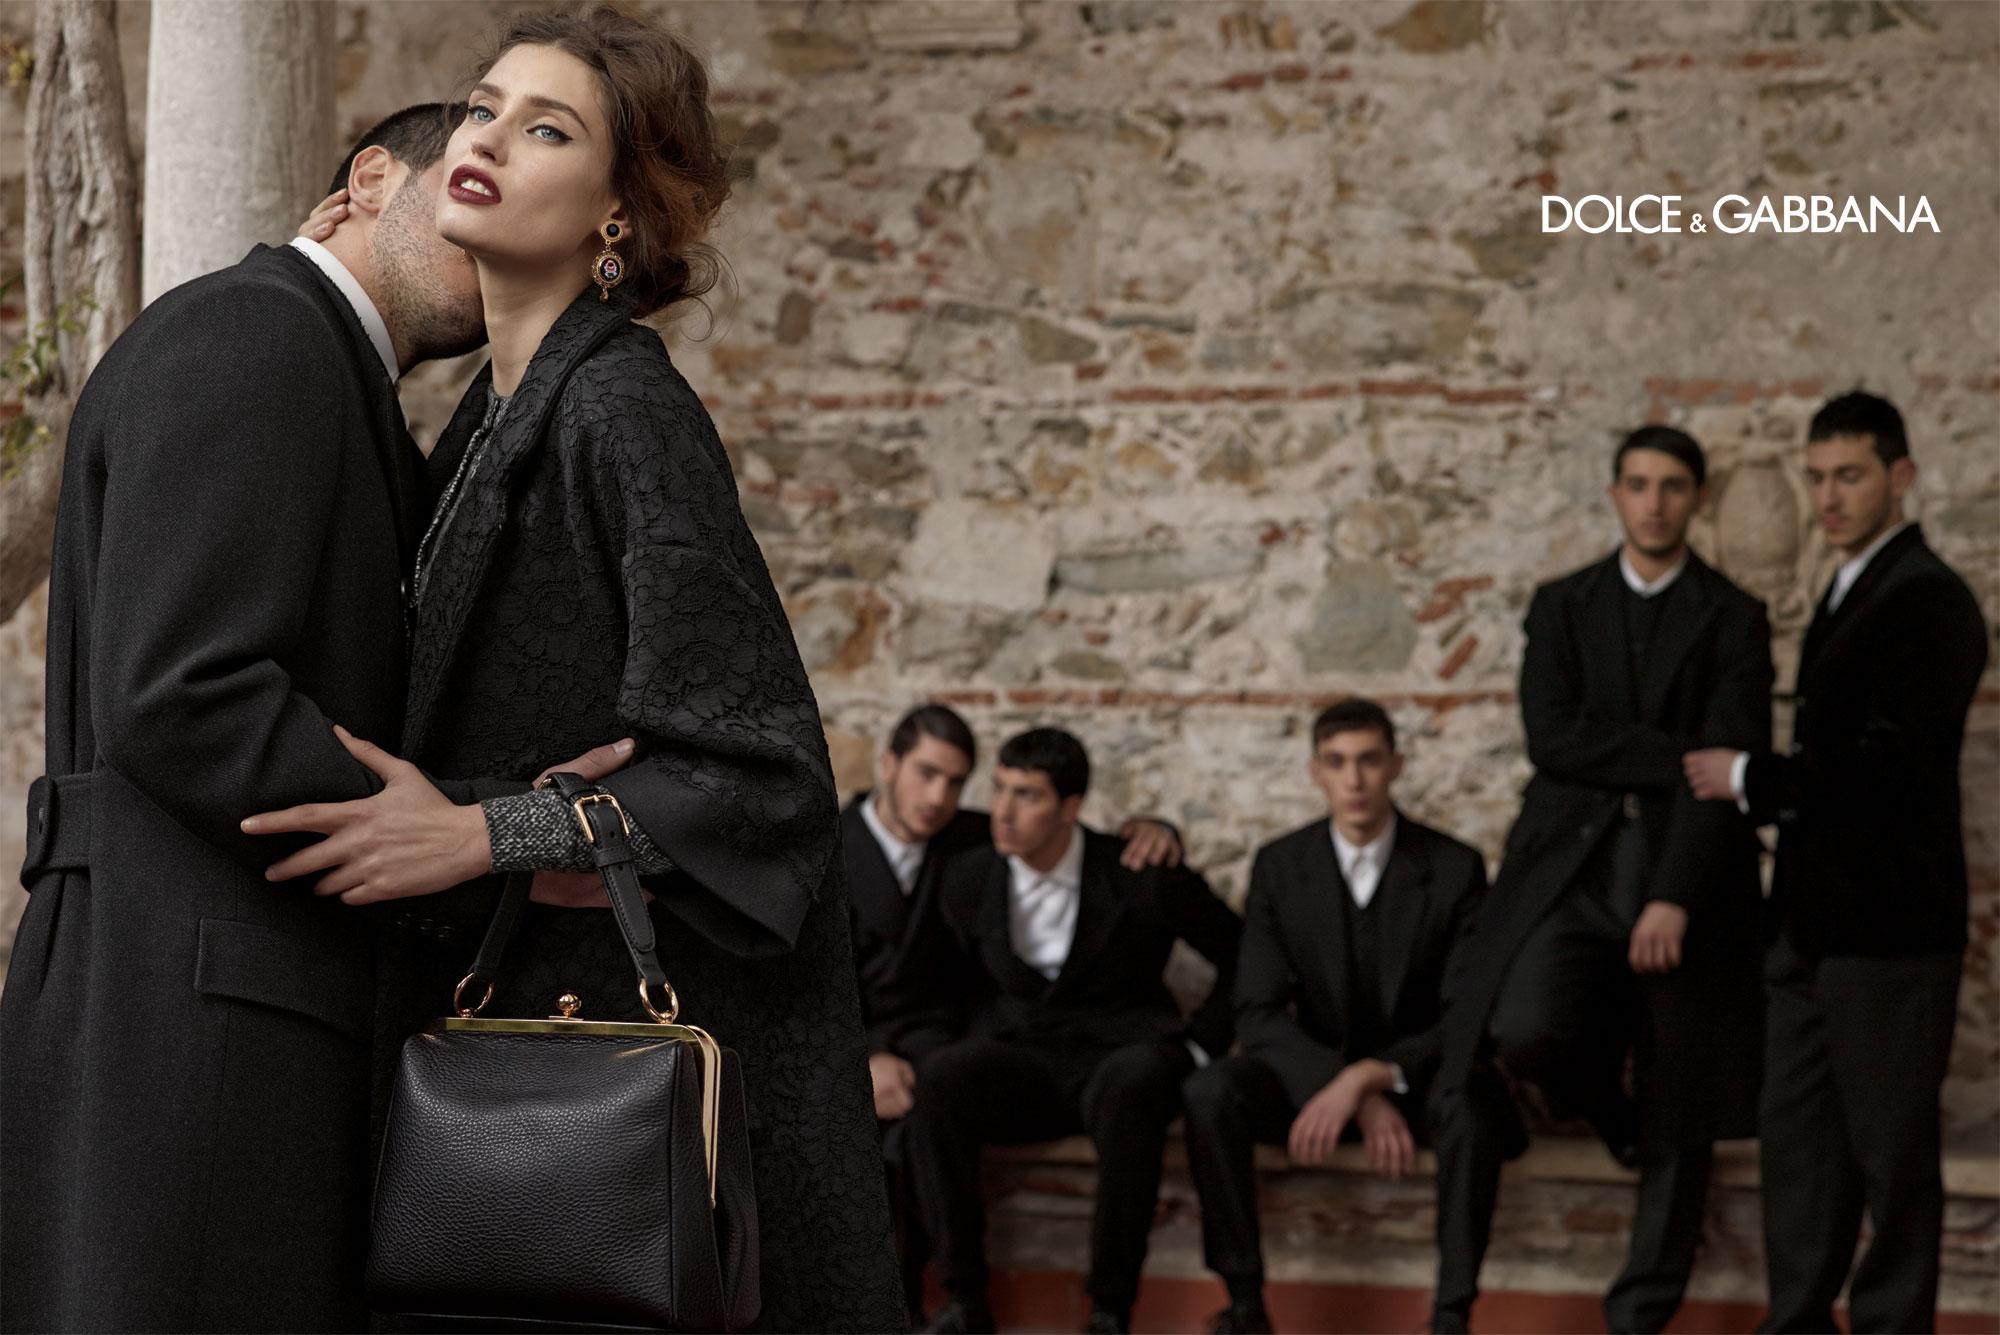 dolce-and-gabbana-fw-2014-women-adv-campaign-10